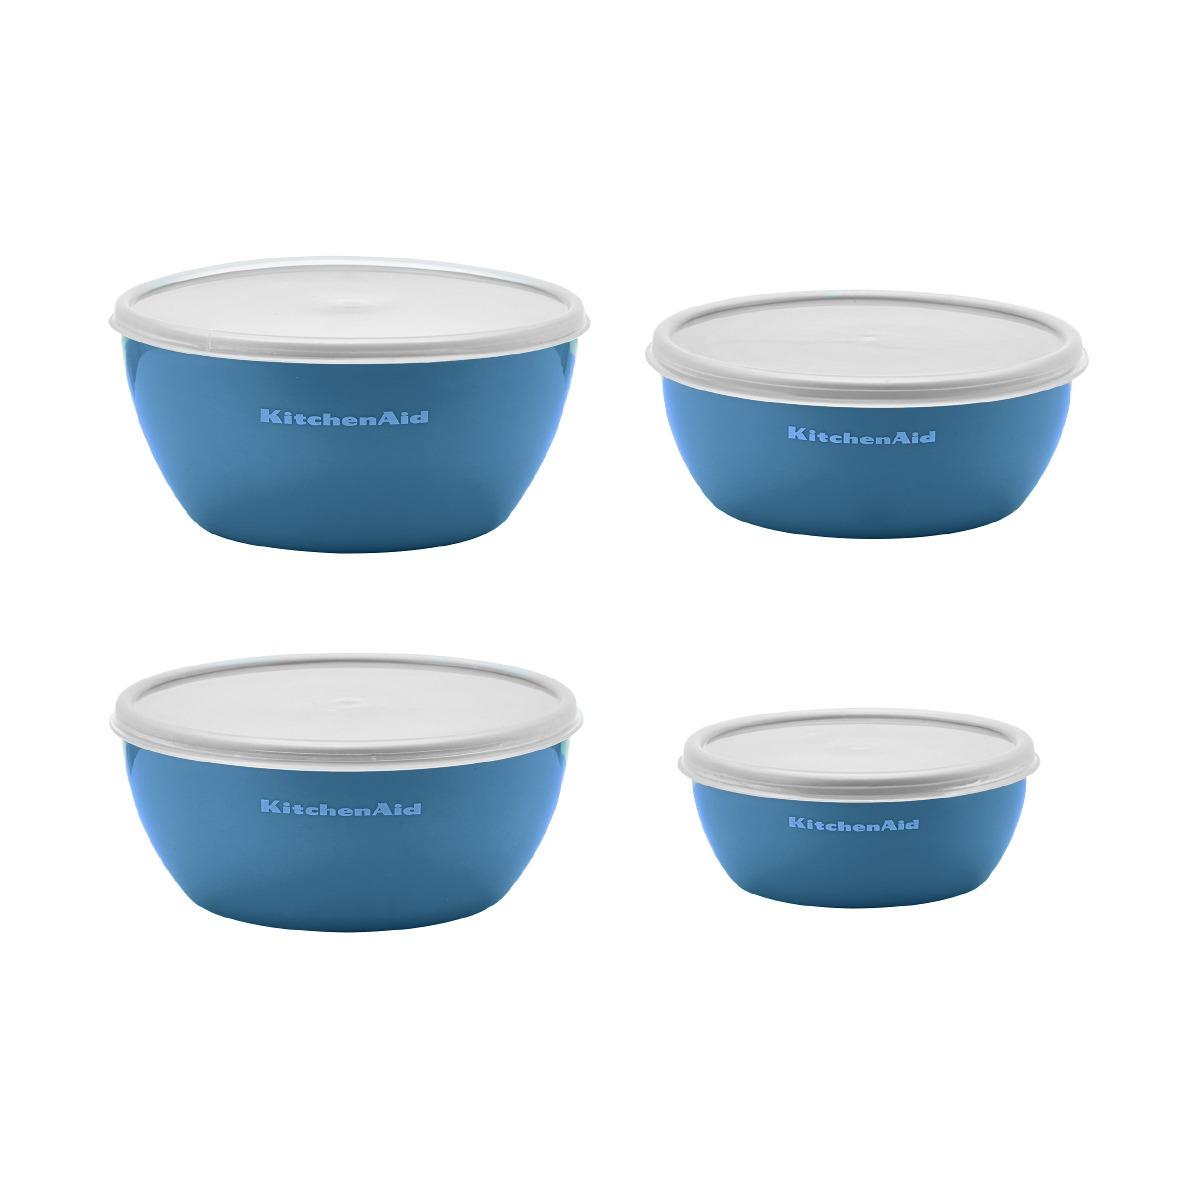 Kitchenaid Prep Bowls with Lids Set of 4 Ocean Blue Dinnerware ...